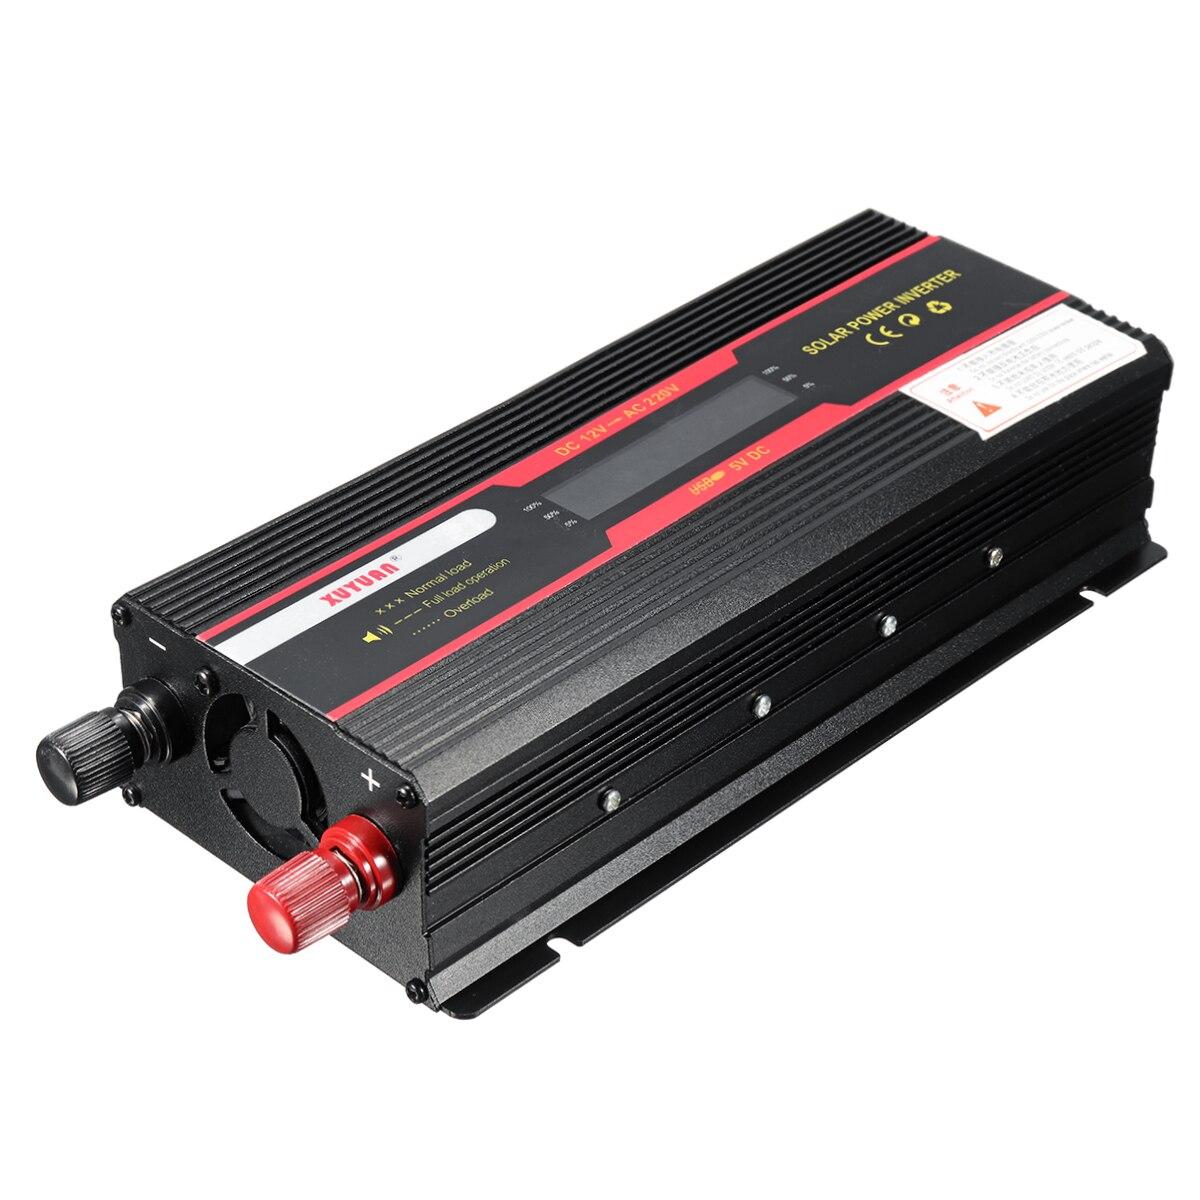 Onduleur de voiture 12 V 220 V 6000 W Pe ak convertisseur de tension convertisseur de tension transformateur 12 V/24 V à 110 V/220 V Inversor + écran LCD - 4